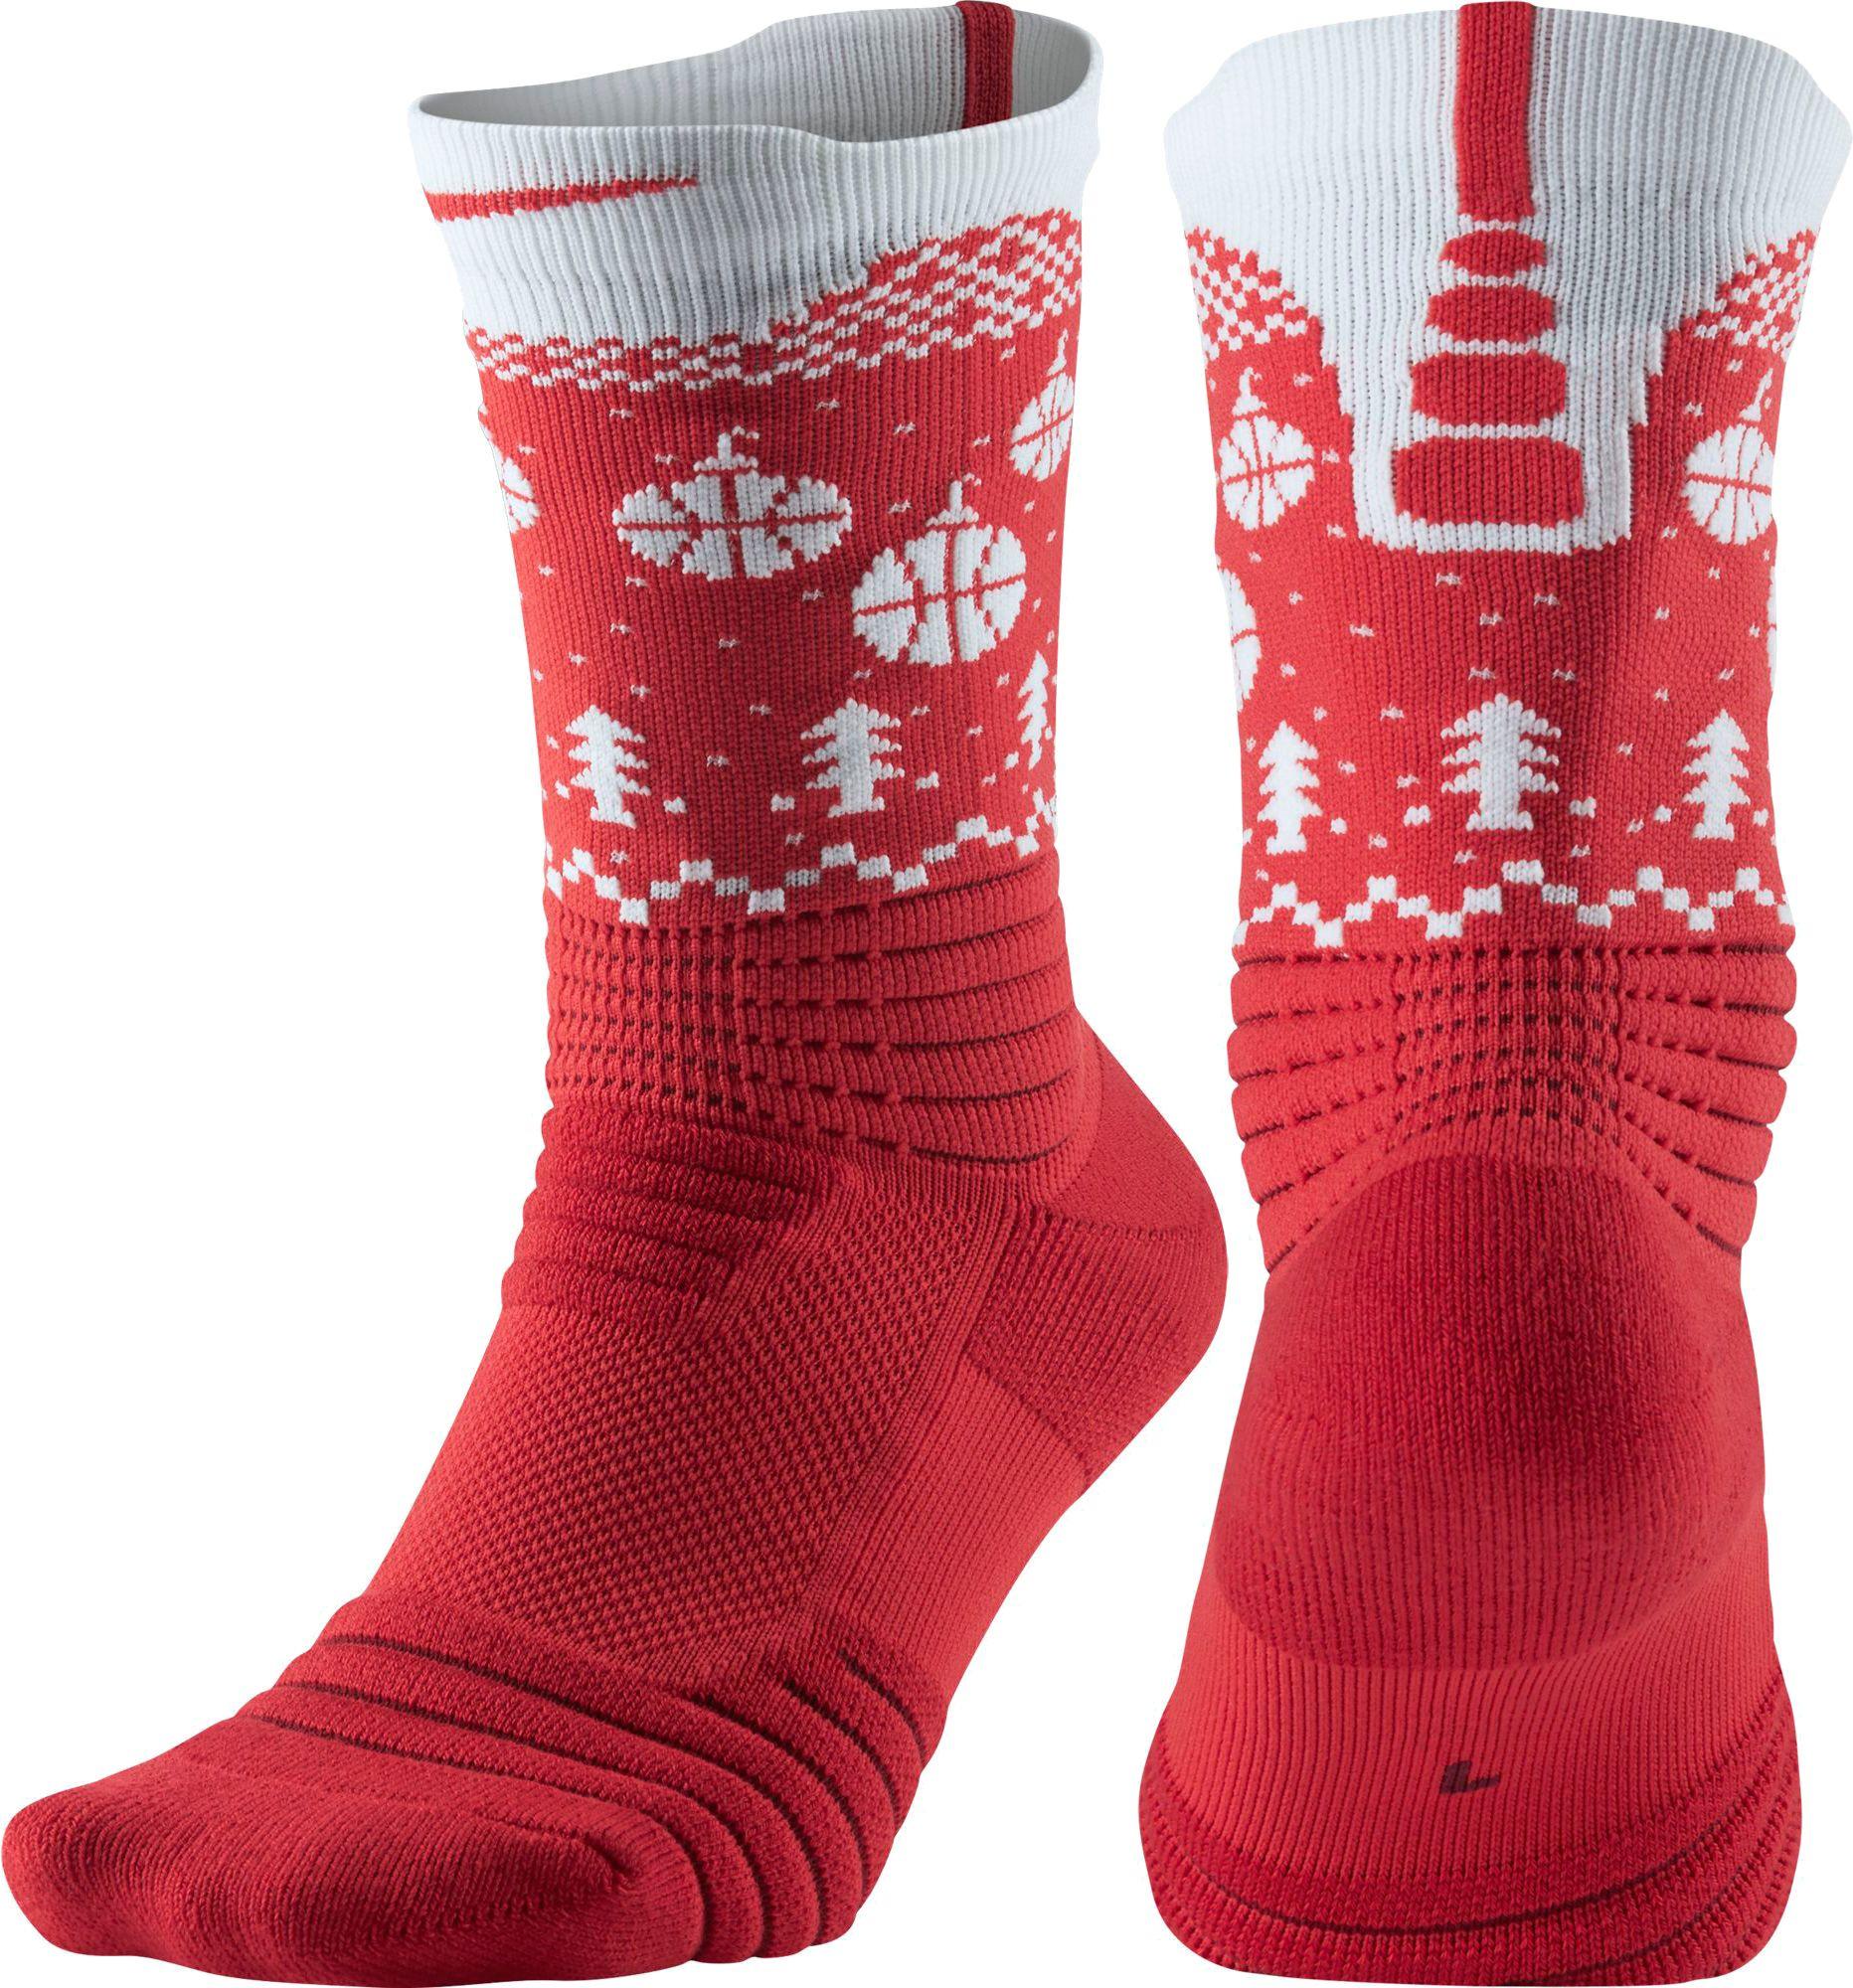 Nike Elite Socks Football Logo Just Wire Christmas Lights Tester Measuringandtestcircuit Circuit Diagram Versatility Holiday Crew Dick S Sporting Goods Rh Dickssportinggoods Com Symbol